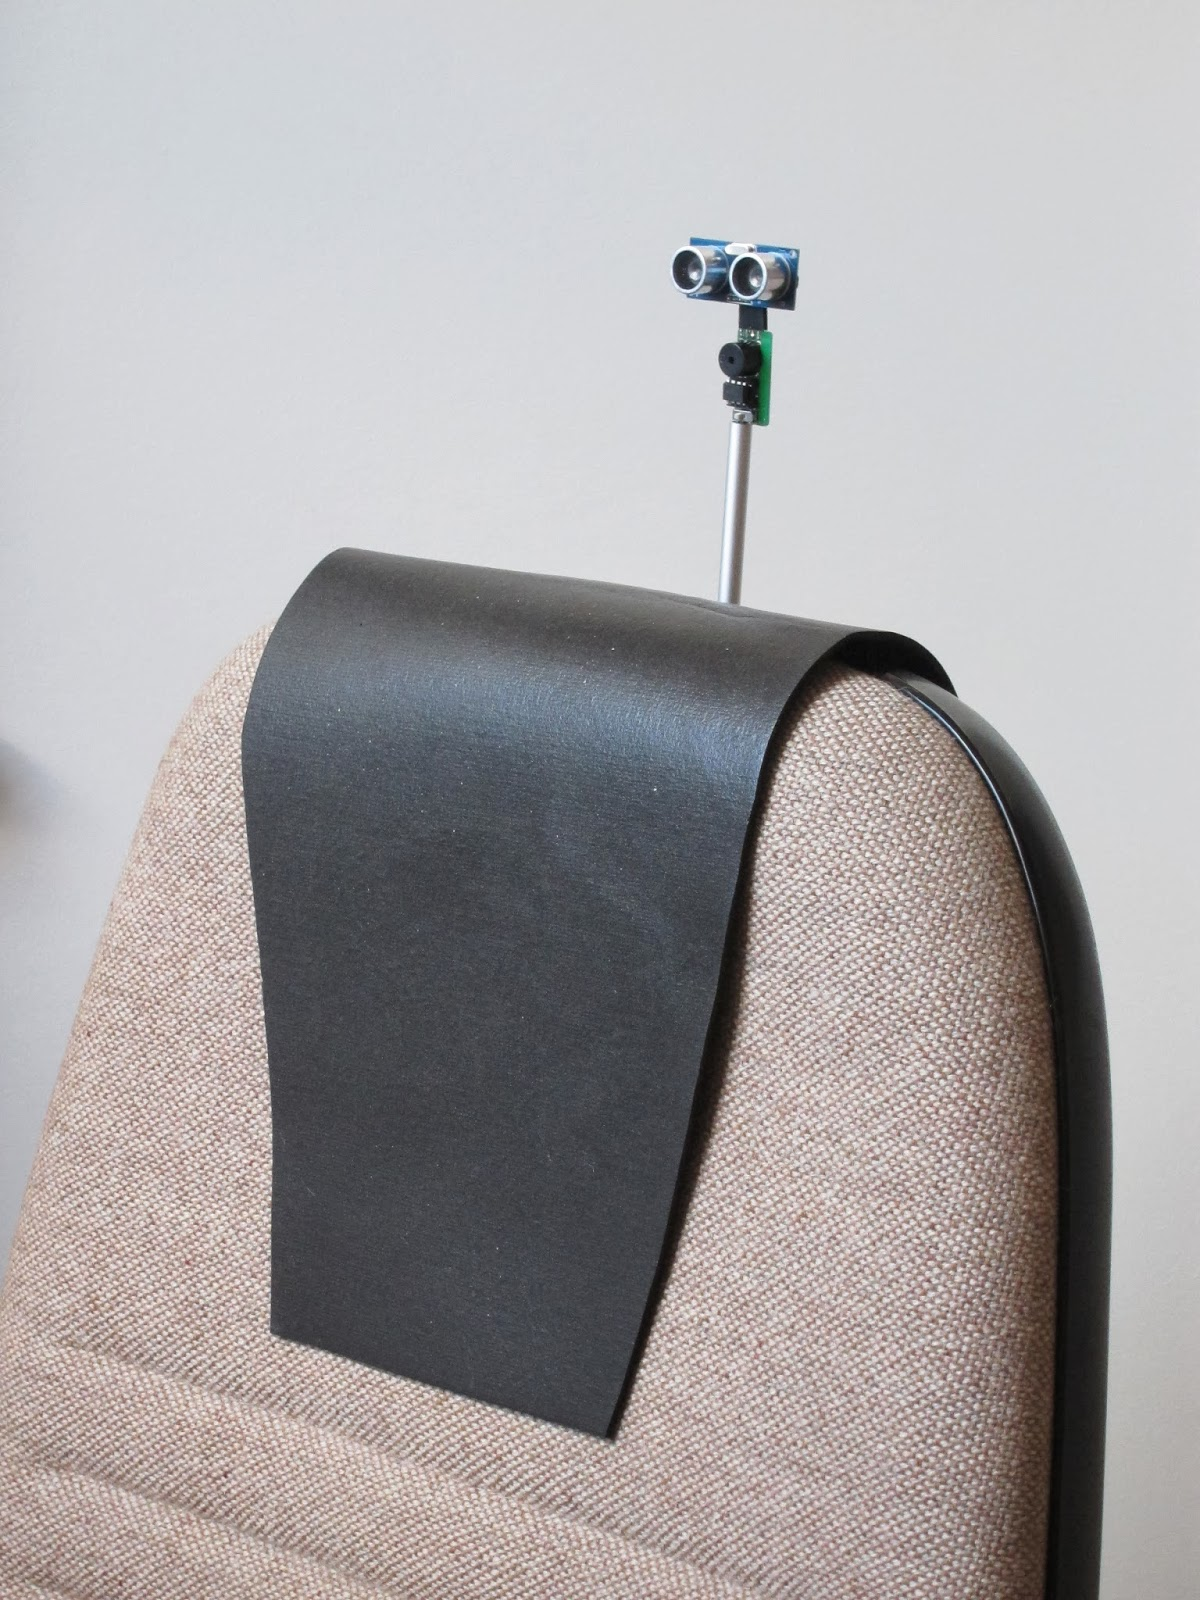 Posture Sensor Chair Wheelchair In Kolkata Coretech Robotics A Very Simple